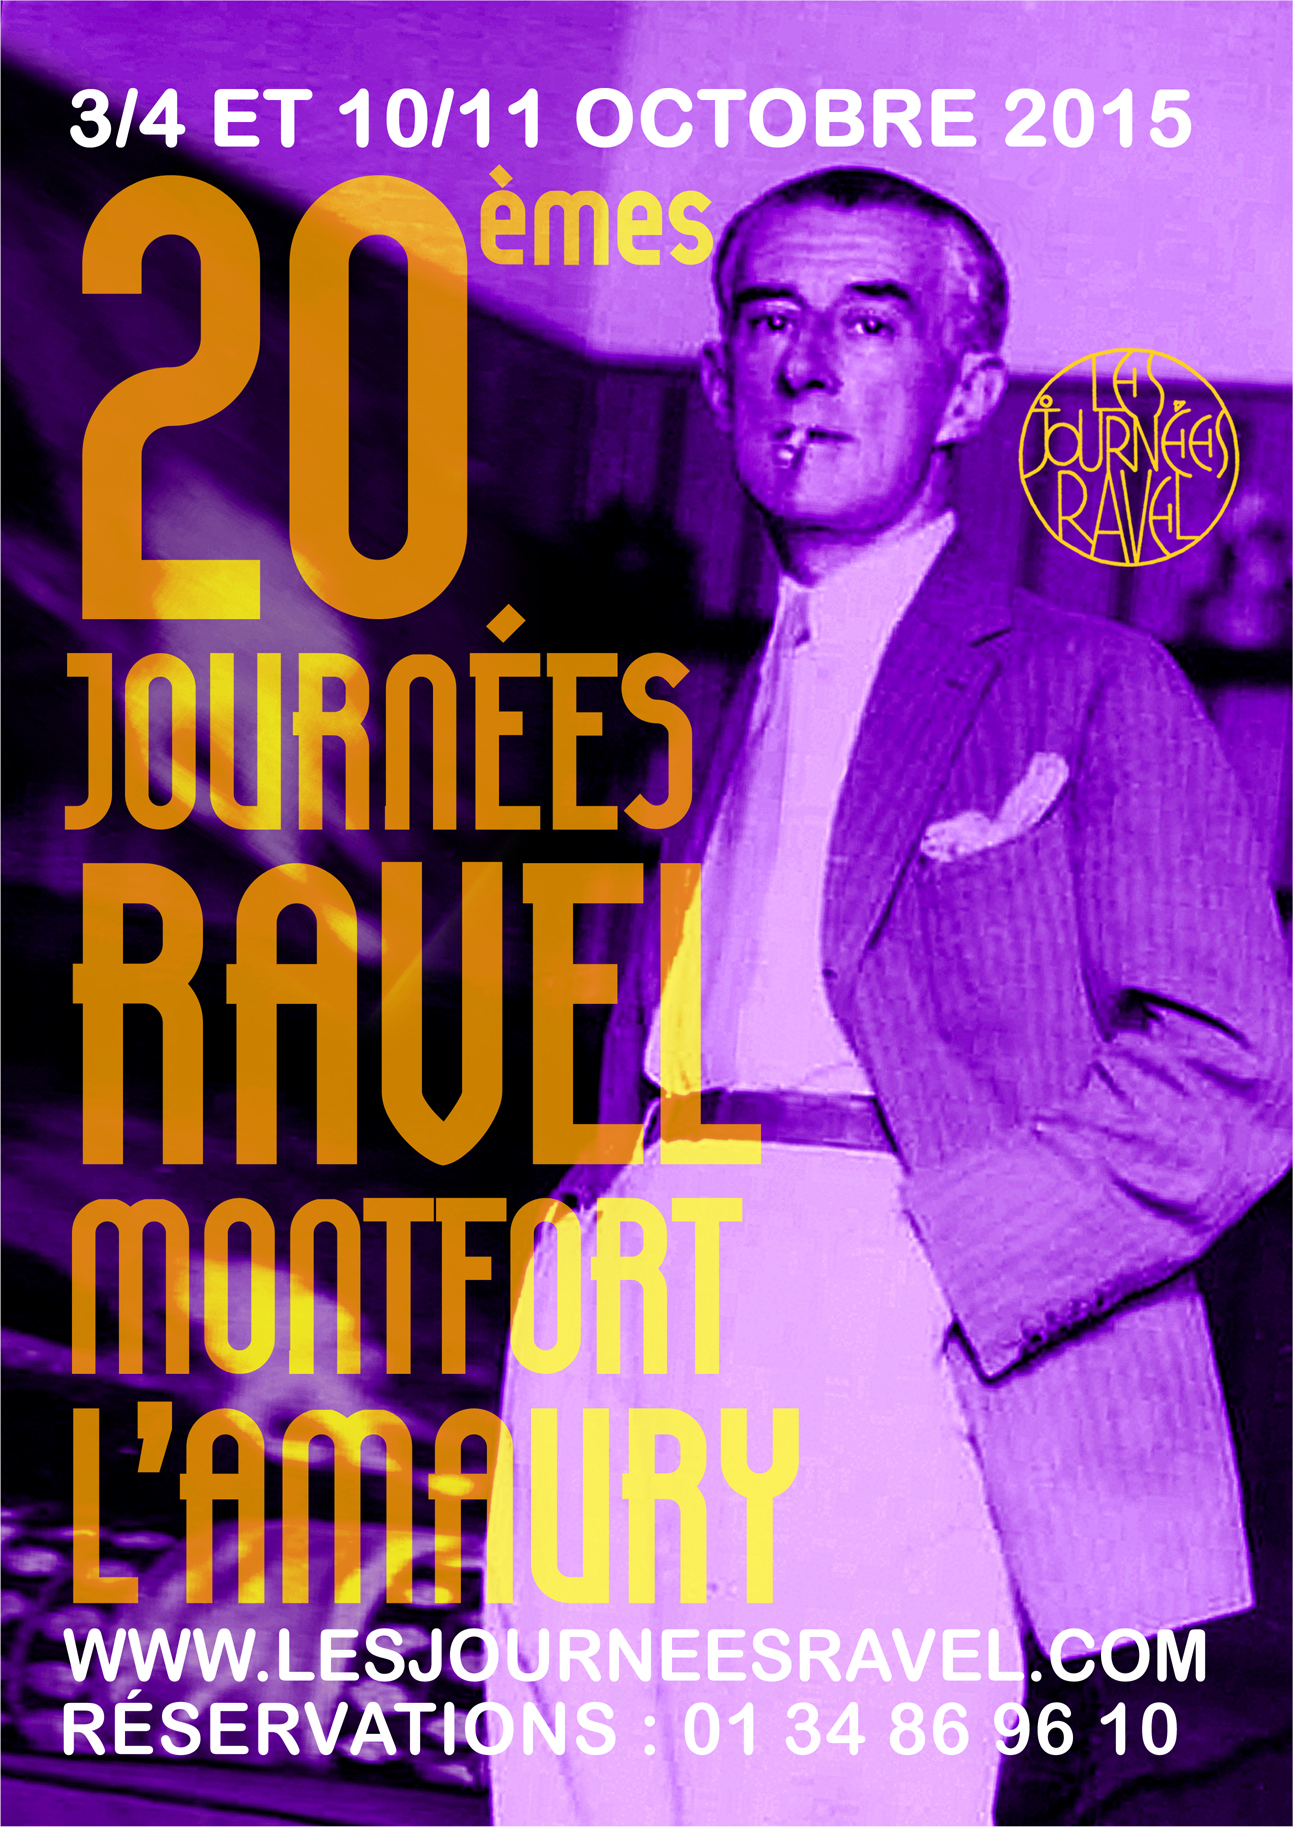 Ravel2015